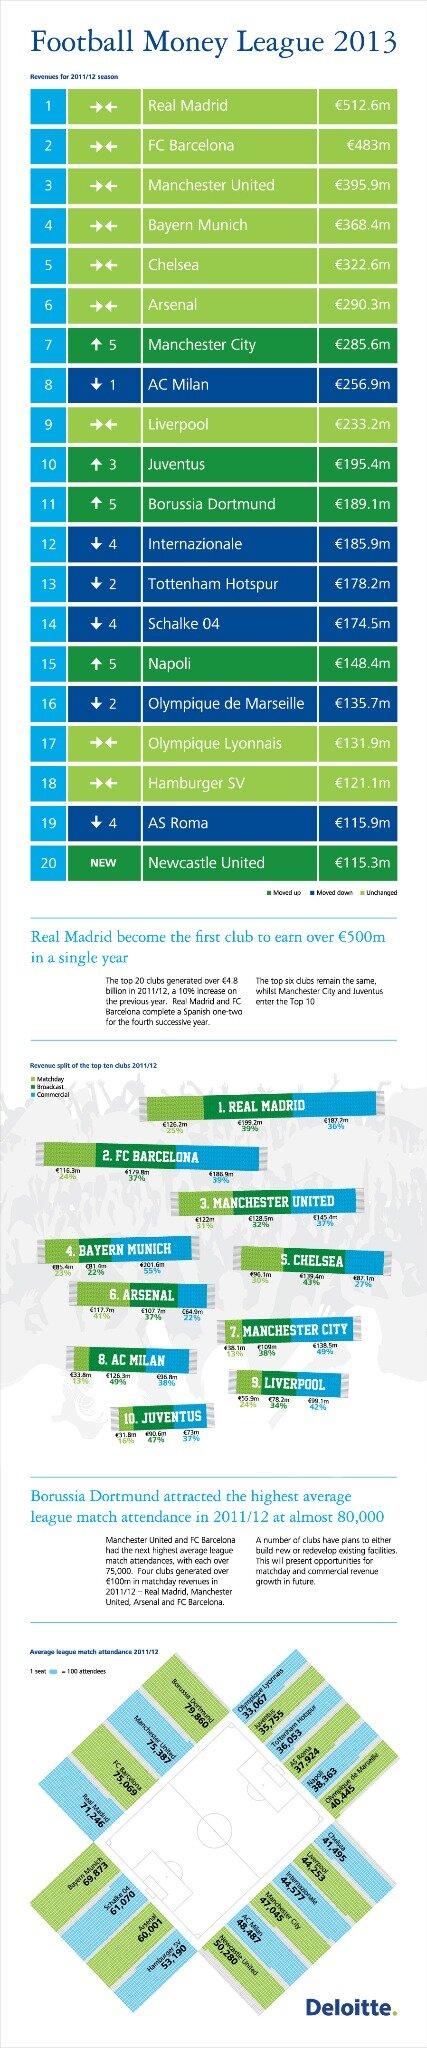 Ranking de clubes de fútbol por ingresos